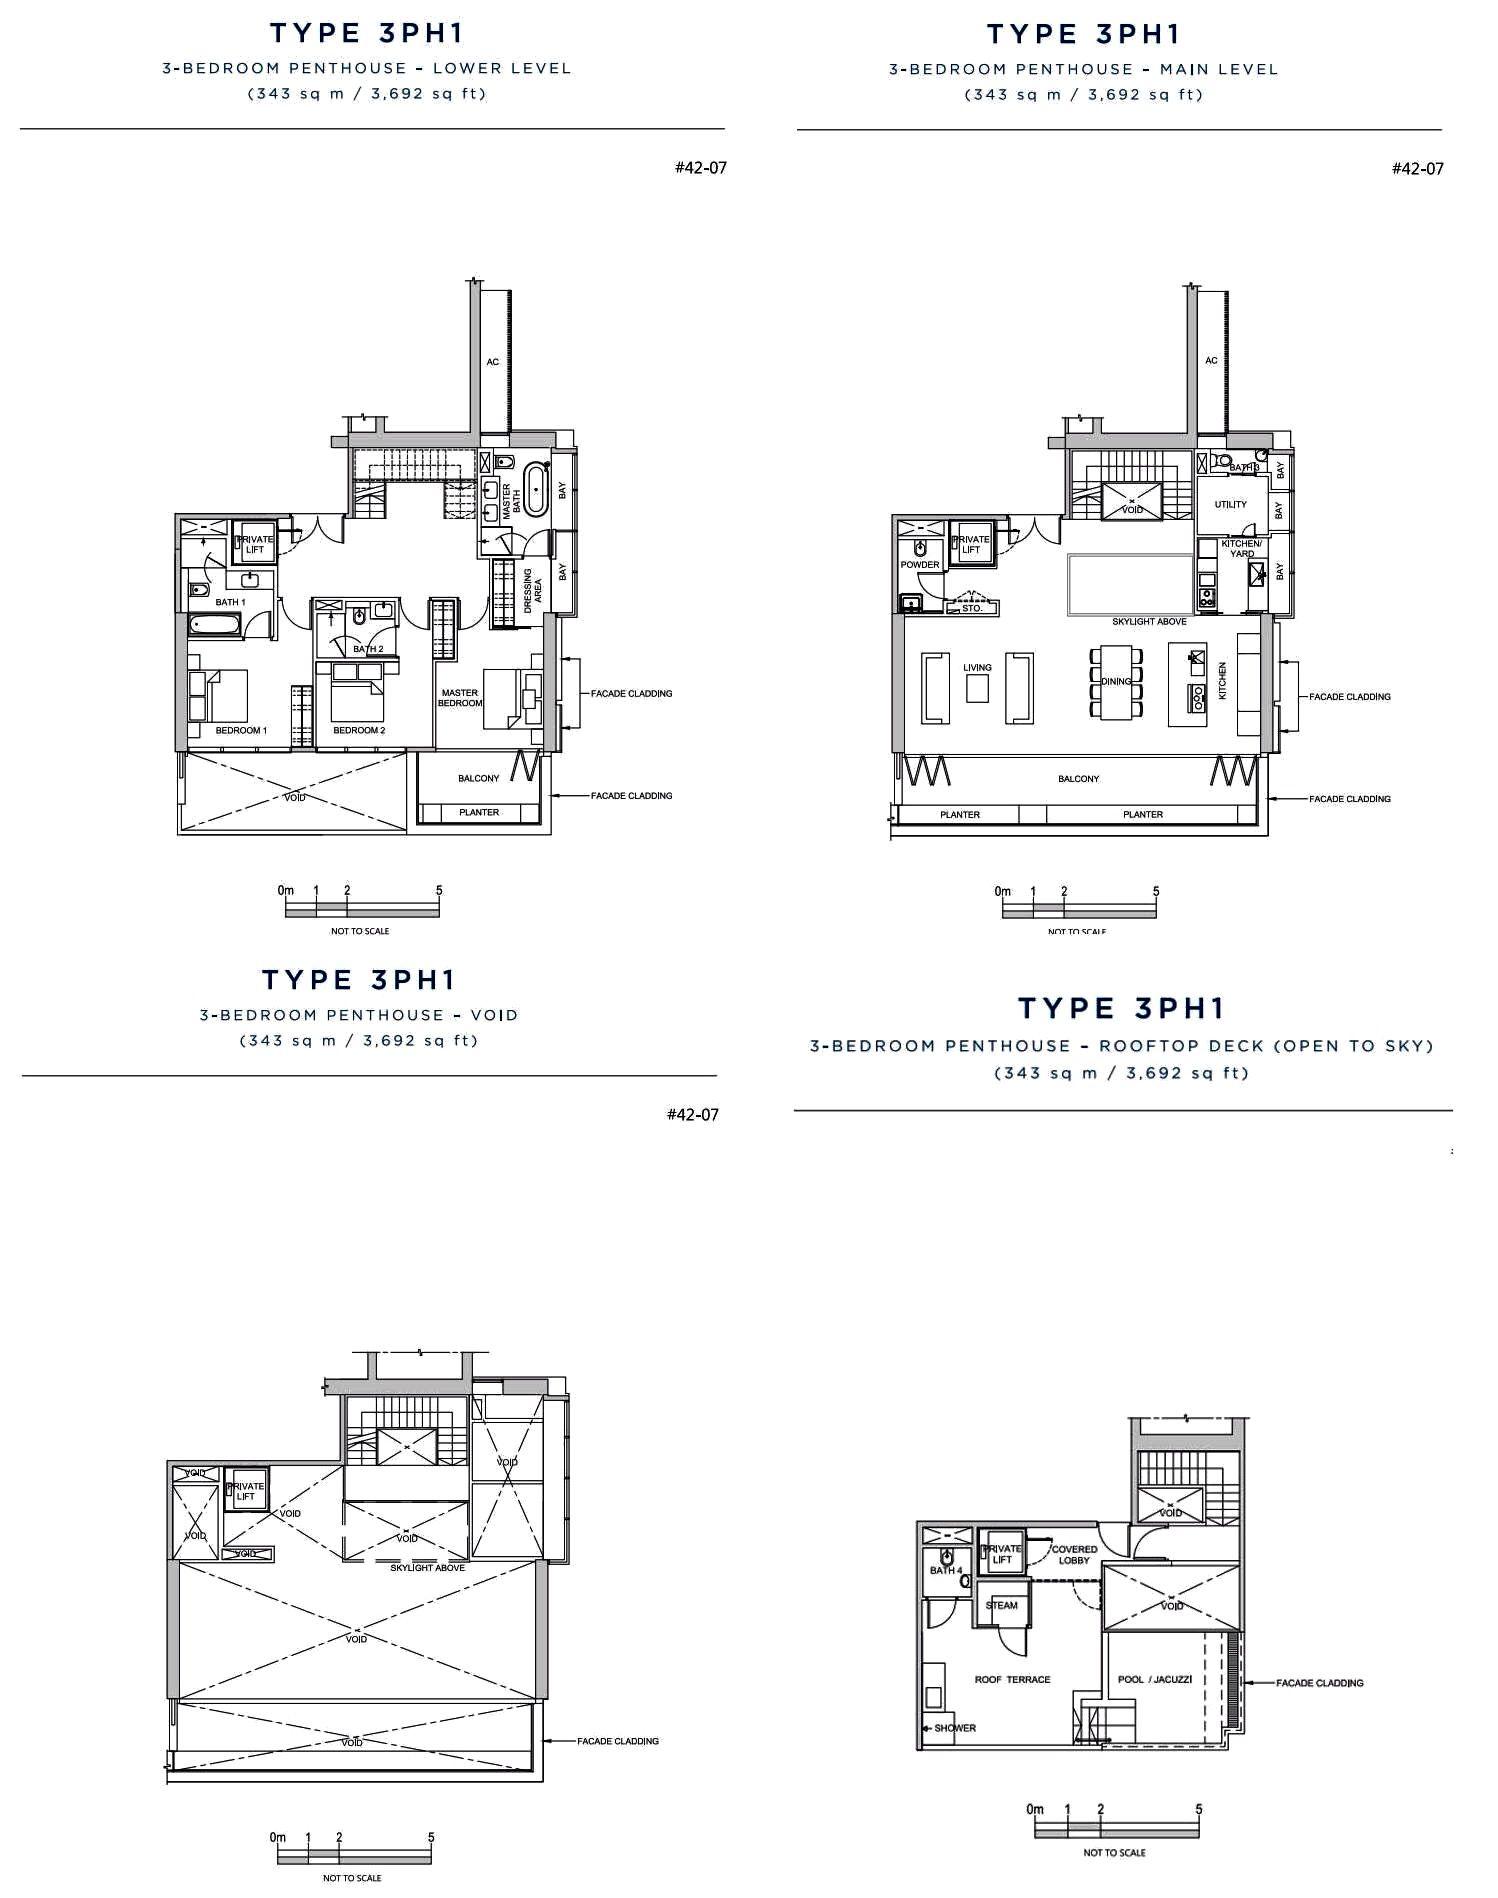 South Beach Residences Singapore Penthouse 3 Bedroom Pent House Floor Plans Penthouse